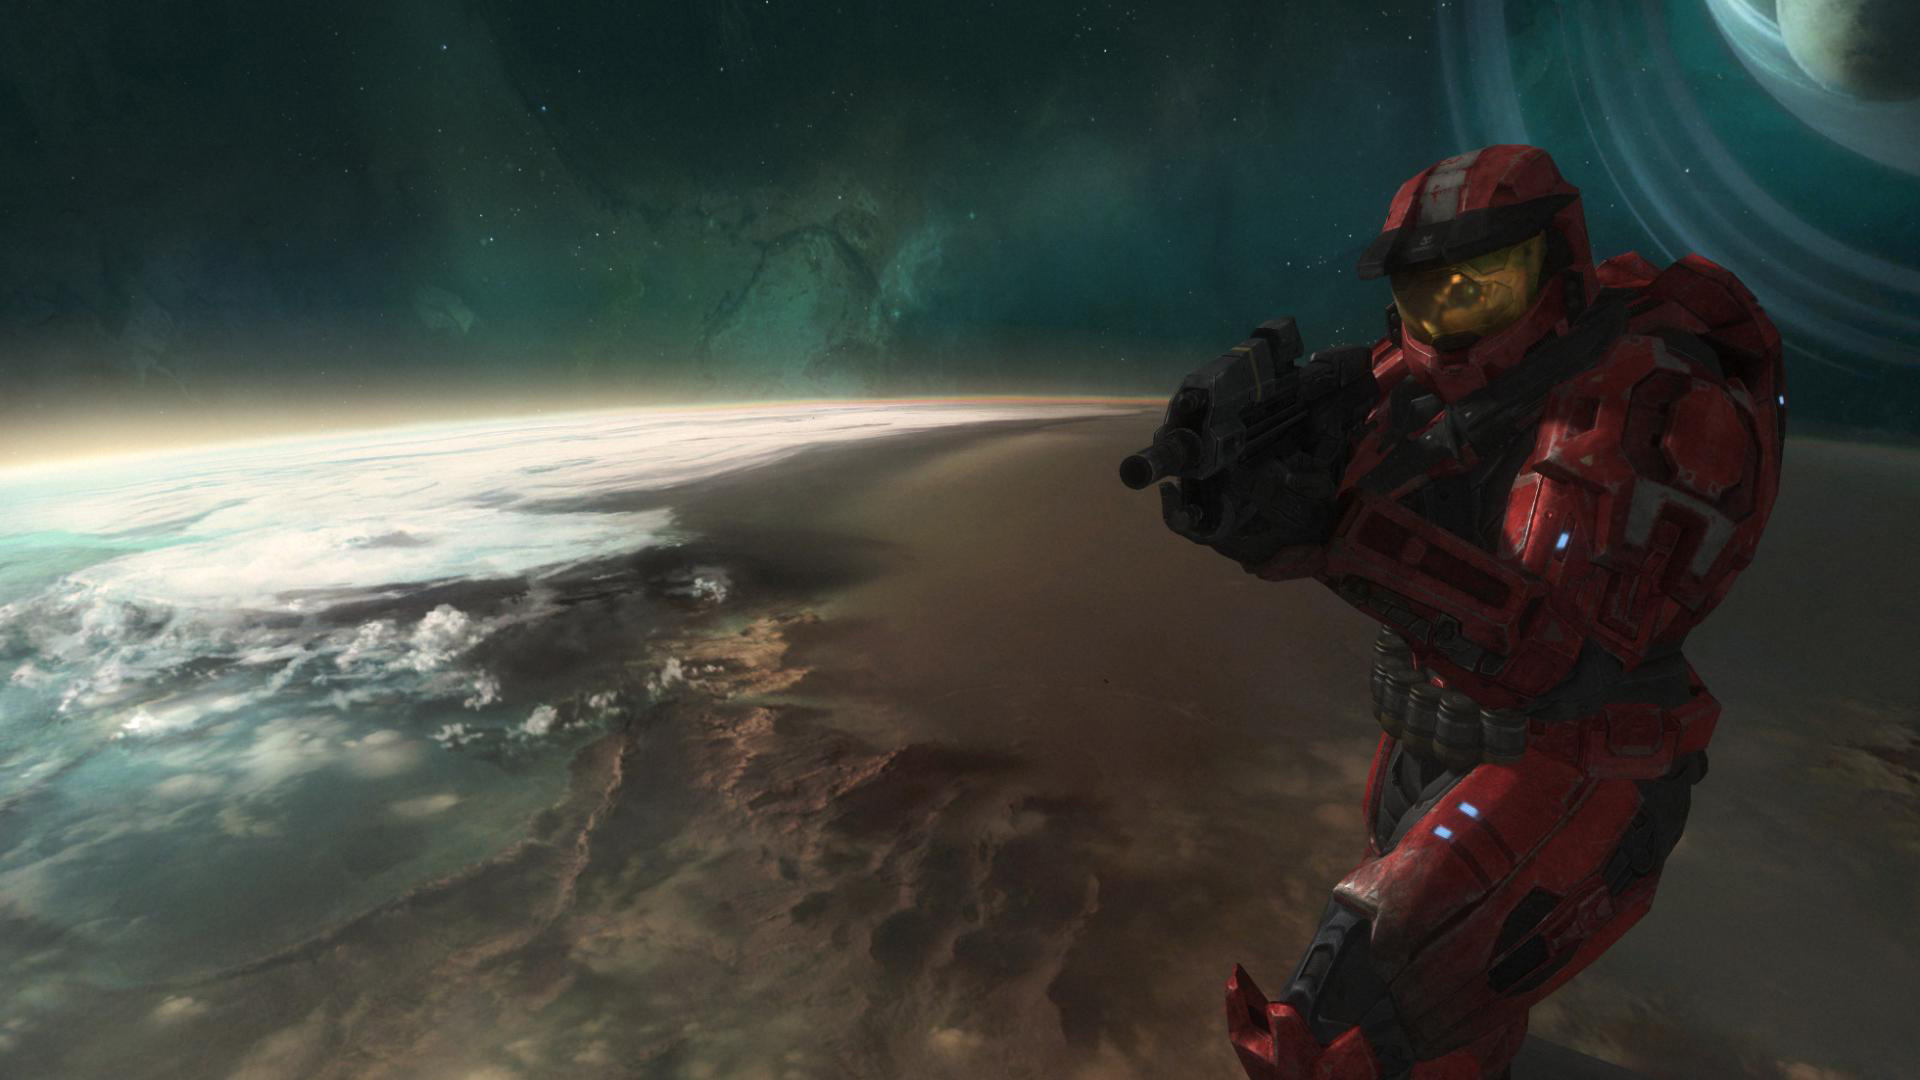 Halo Reach Space Screenshot